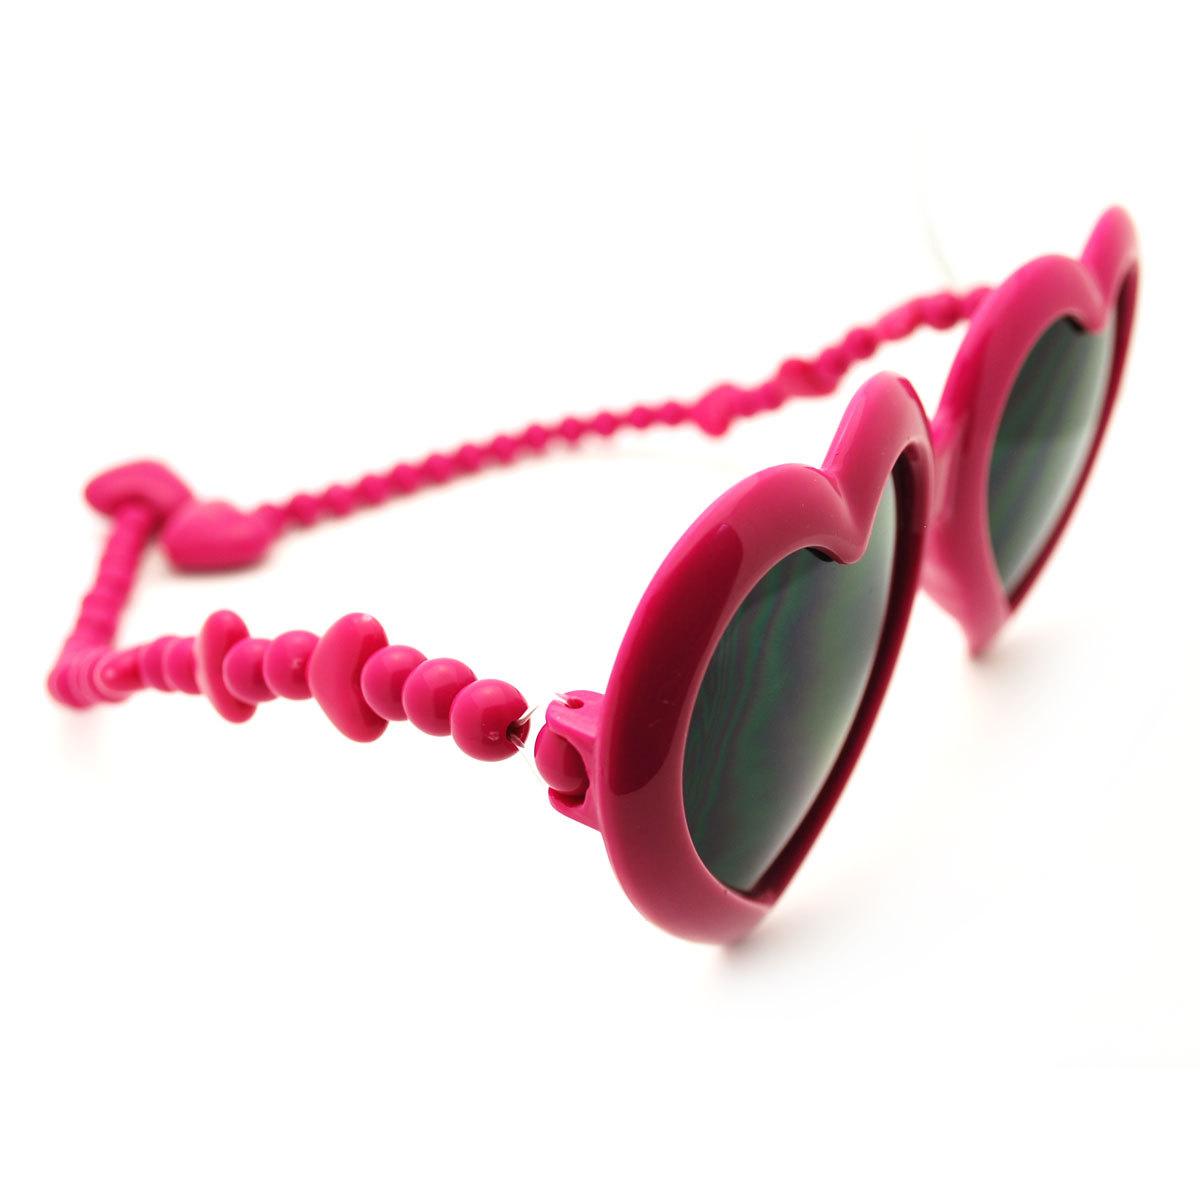 Heart Shape Plastic Party Shade Sunglasses w/ Unique Flexible Bead Arms